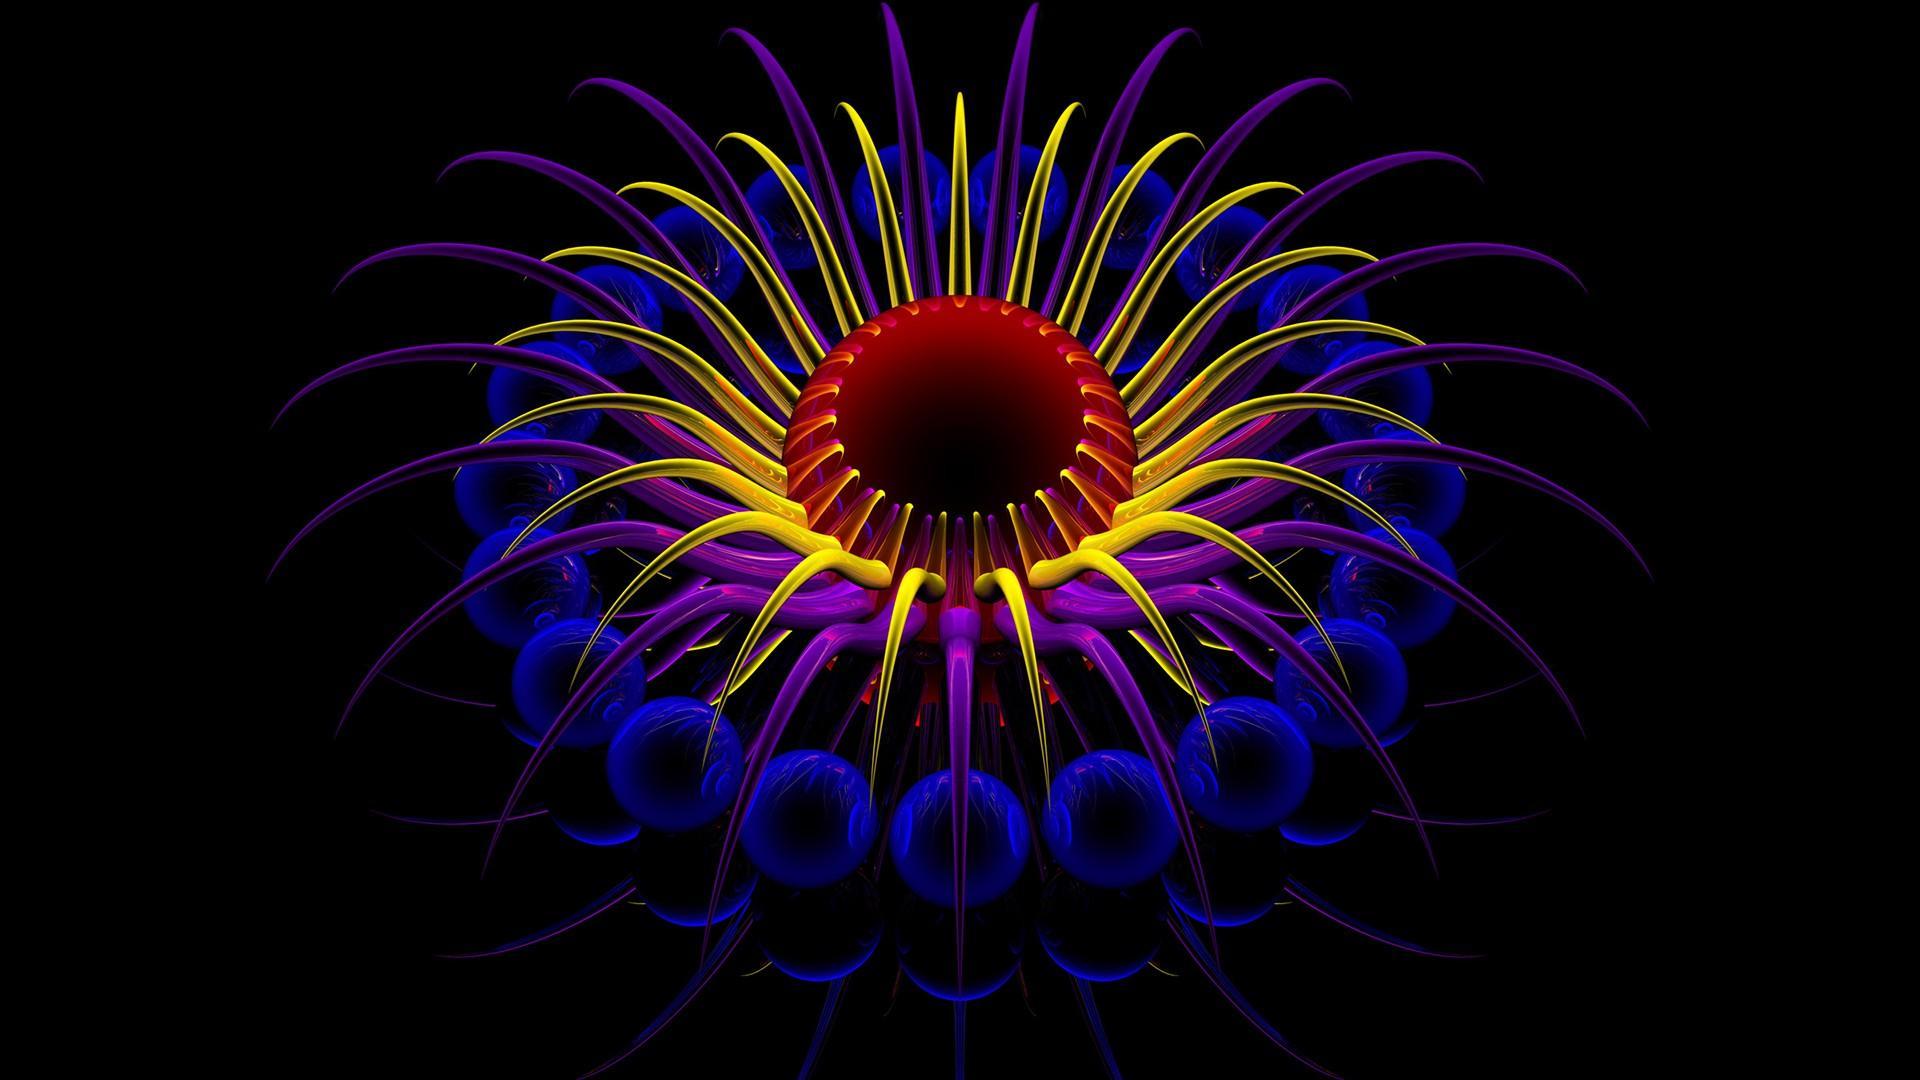 49+ 3D Neon Wallpaper on WallpaperSafari